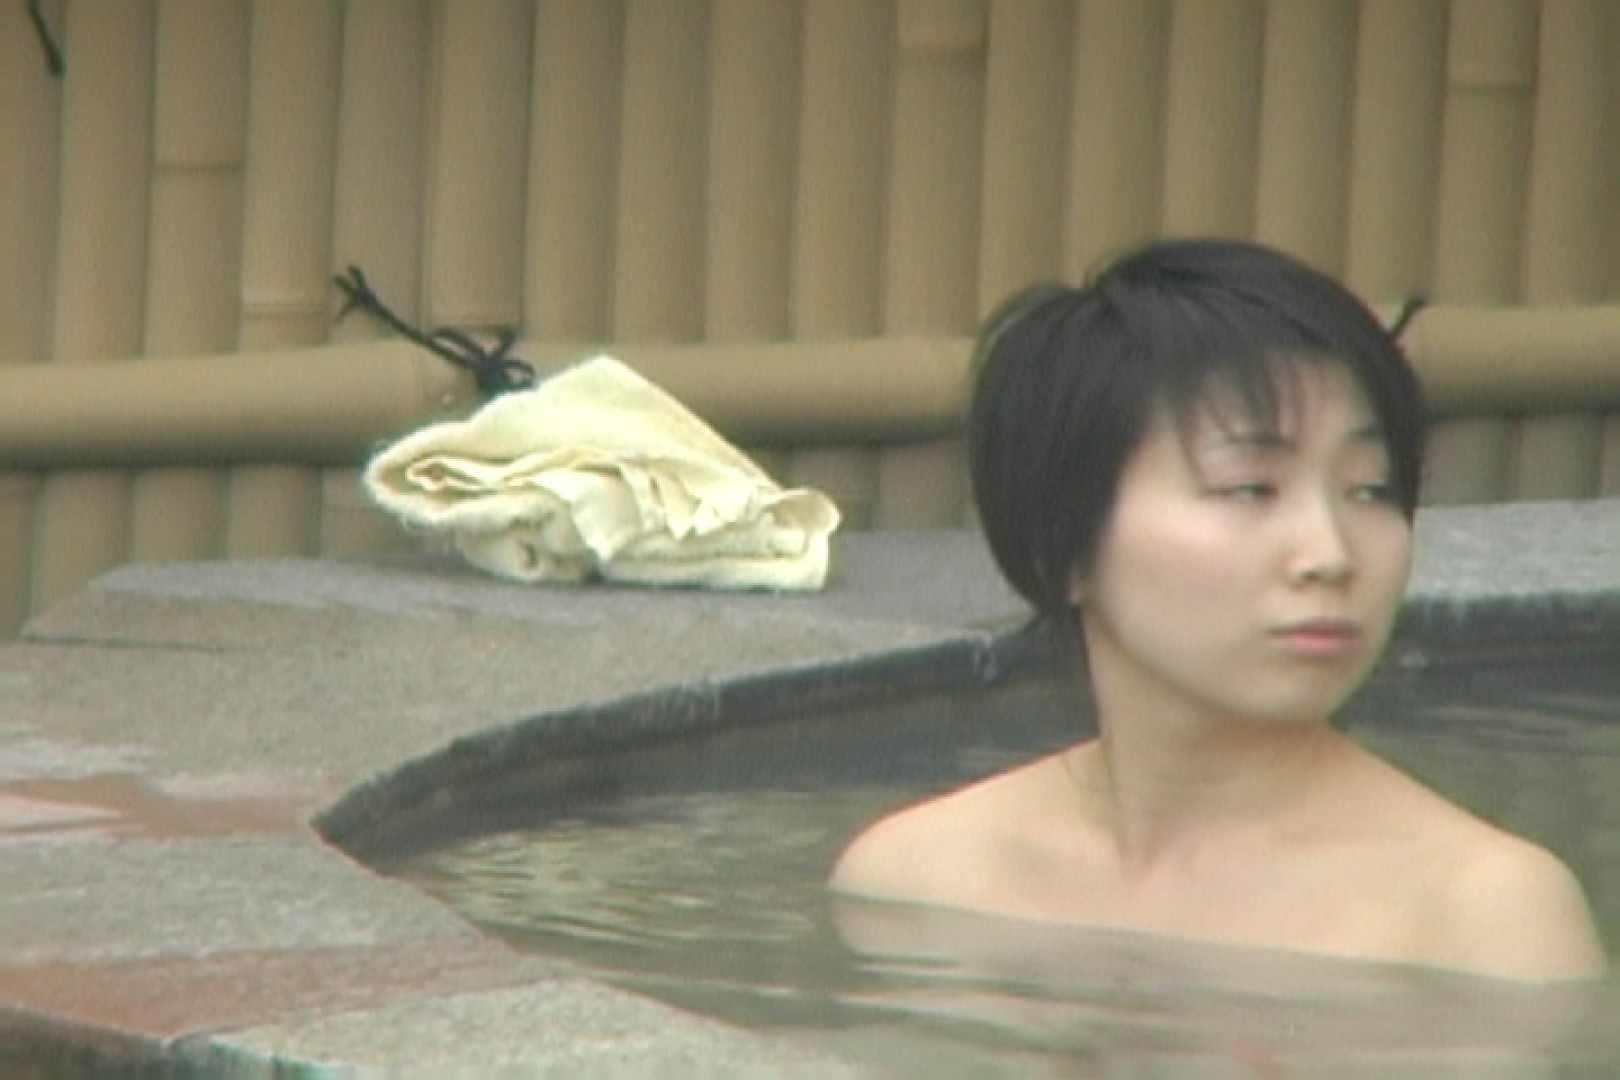 Aquaな露天風呂Vol.567 0  105連発 58